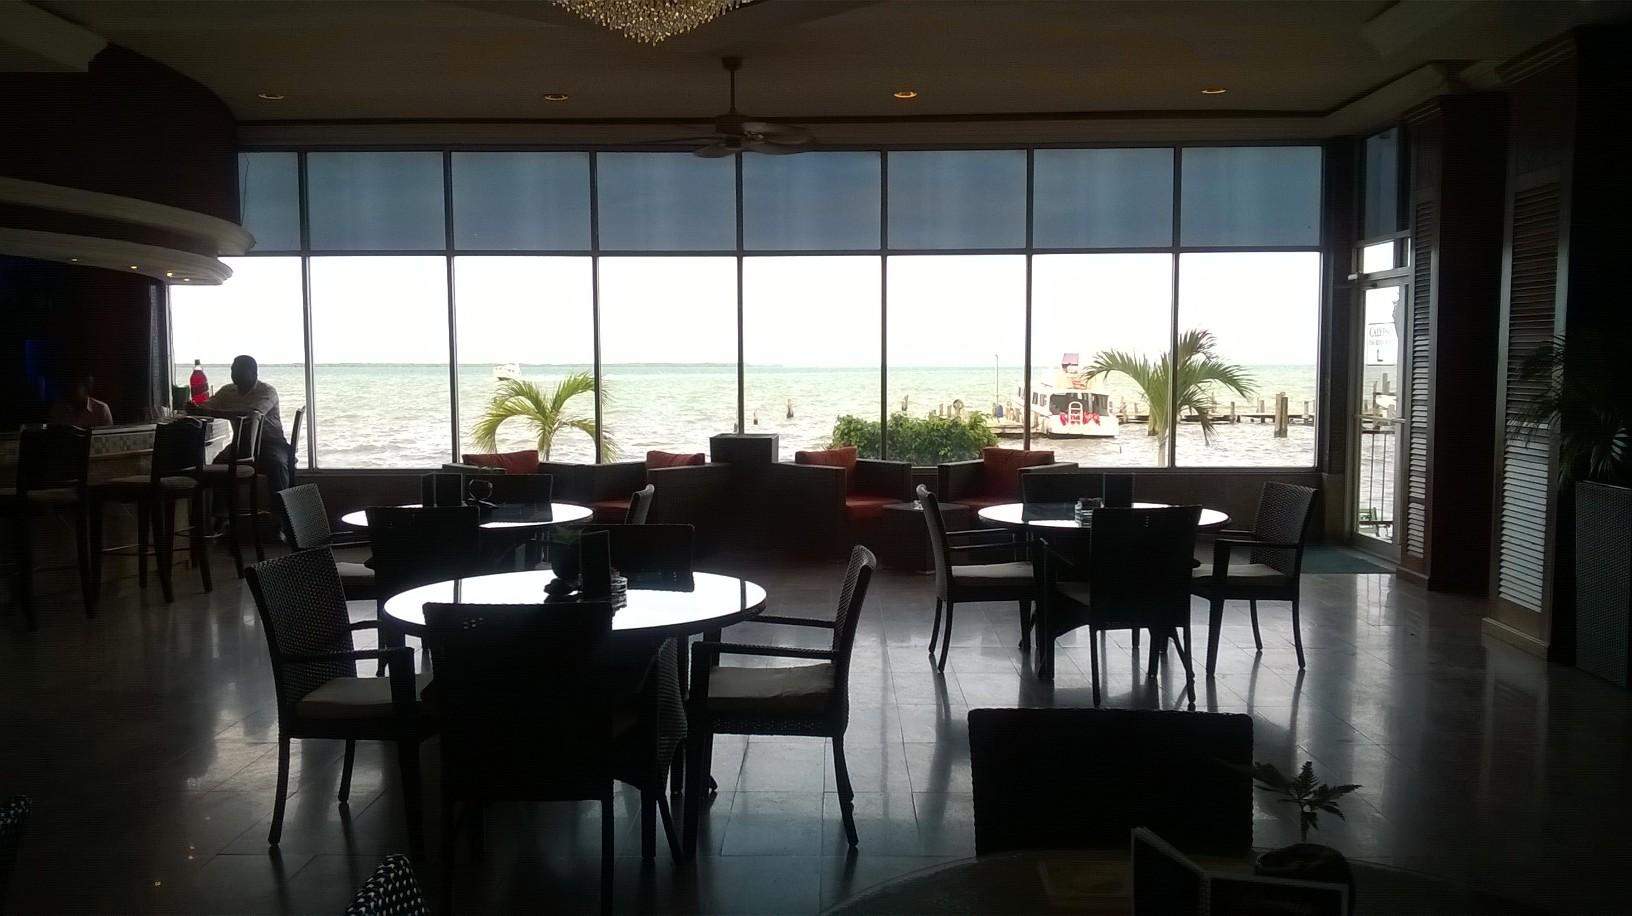 belize-ramada-hotel-resto-lobby-jul14